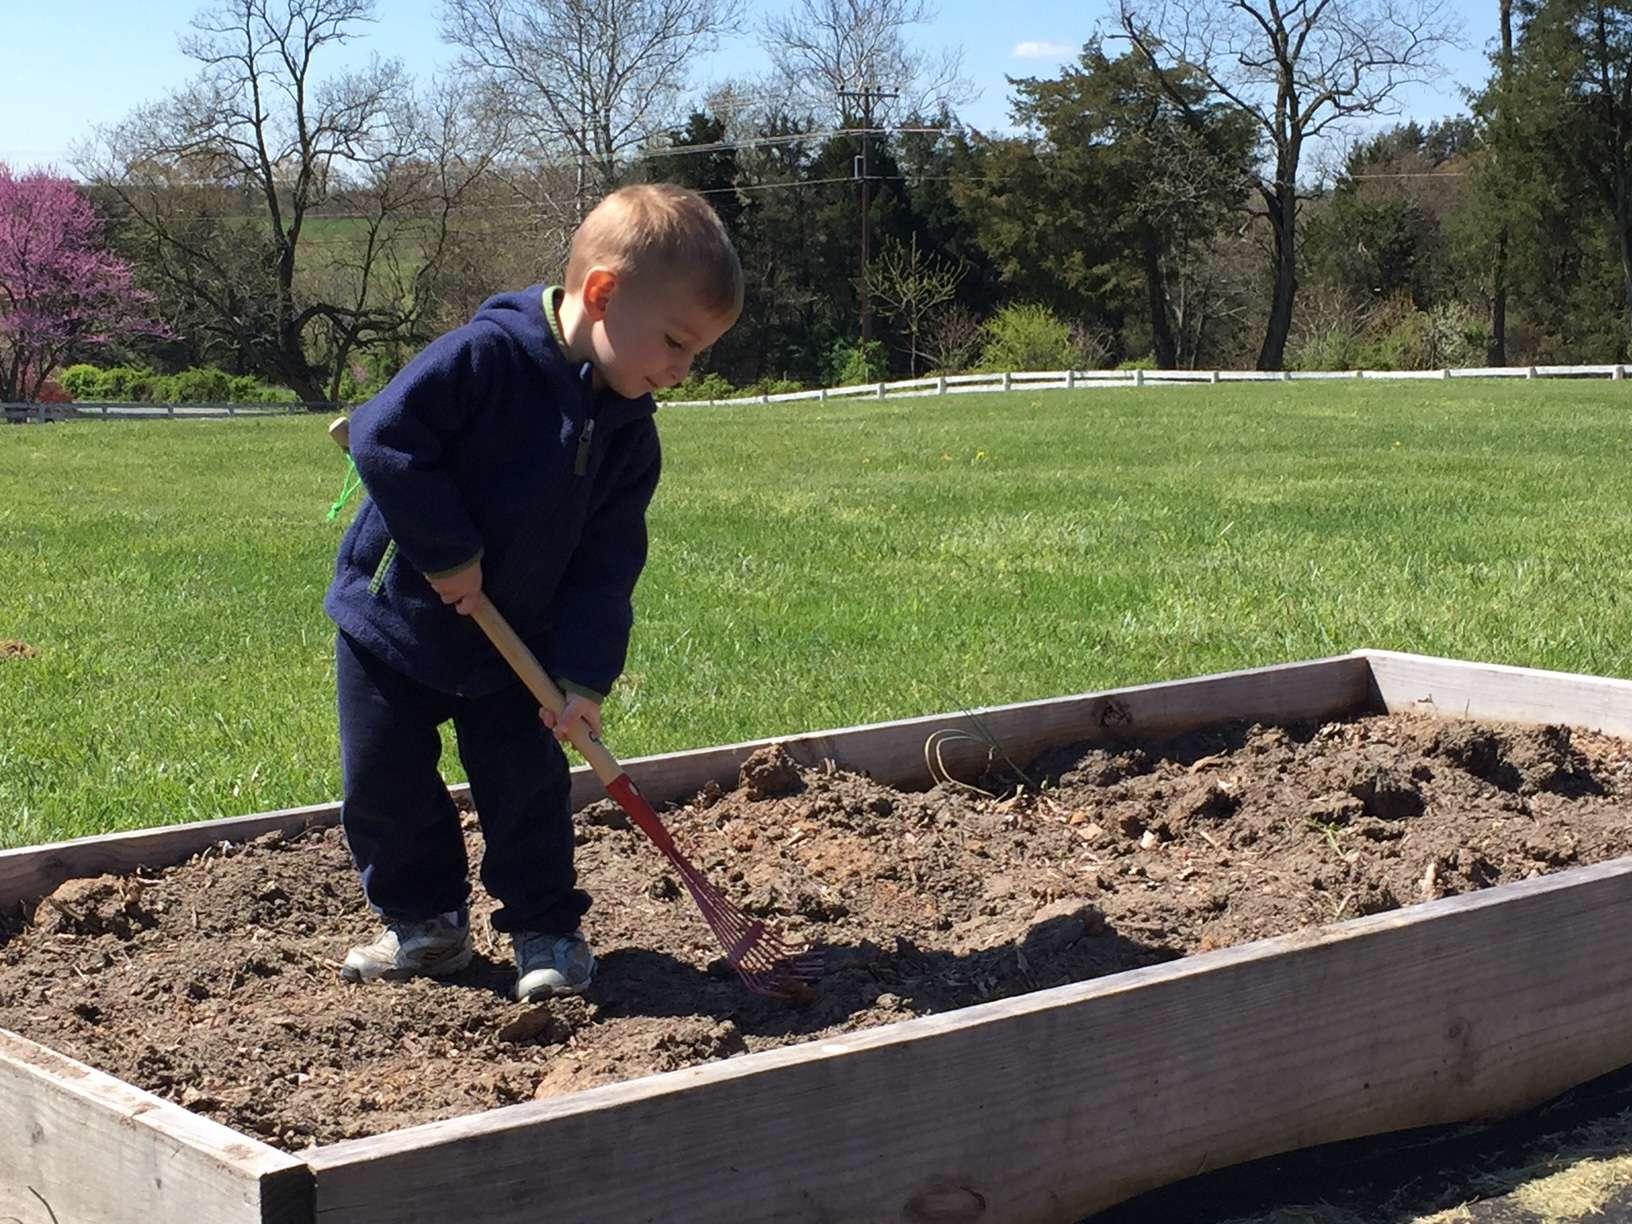 A small boy doing gardening